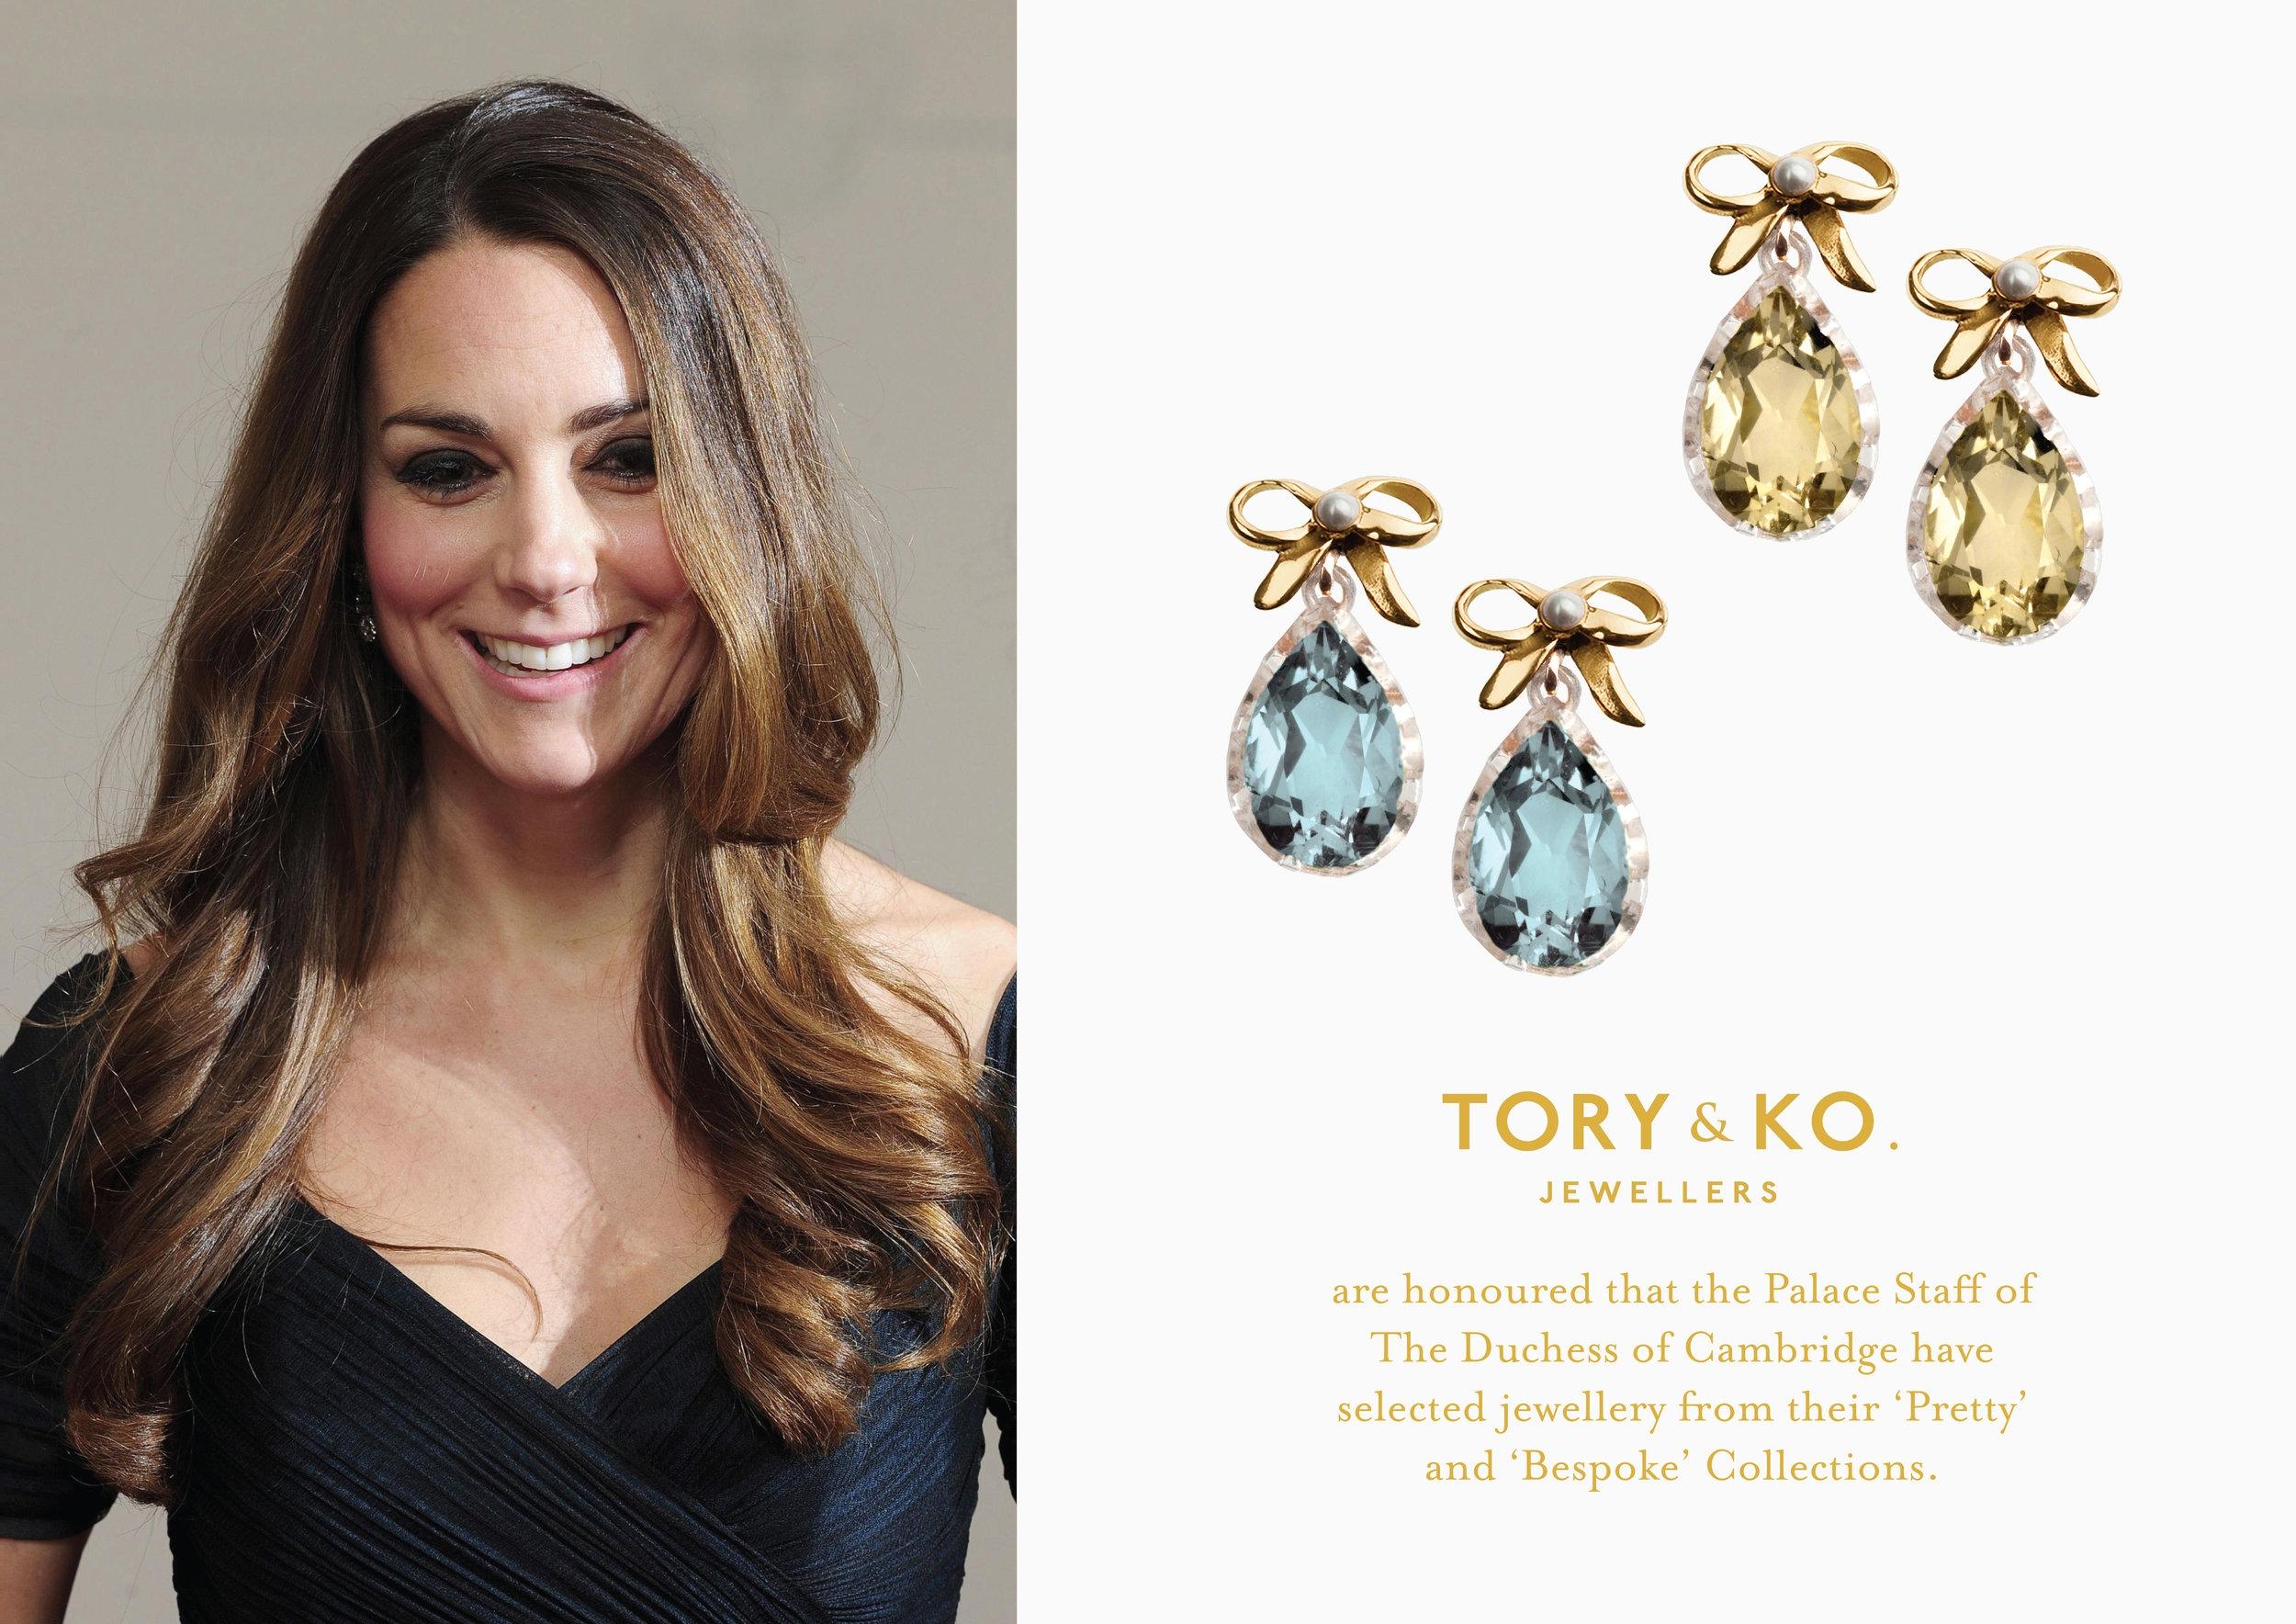 Kate Middleton Poster TORY & KO and KO Pretty Collection.jpg